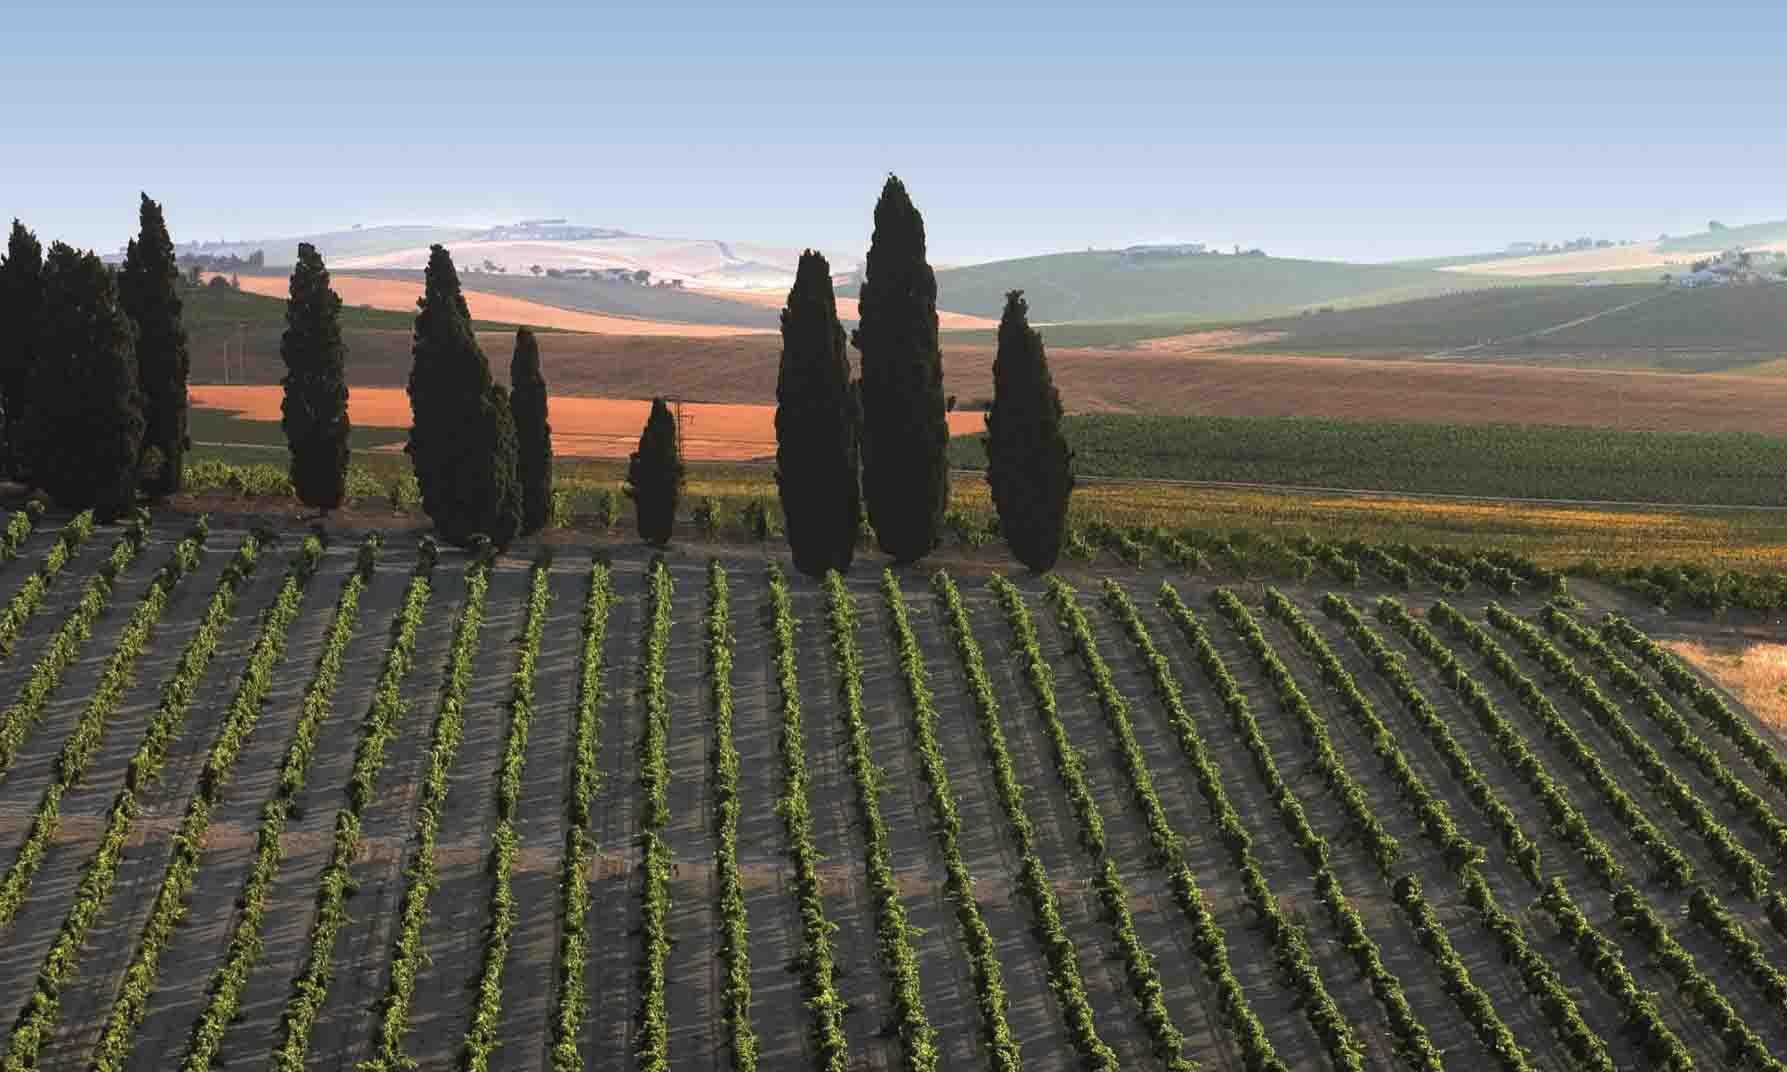 Rincones de Andalucía: viñedos de Jerez de la Frontera (Cádiz) / Places of Andalusia: vineyards of Jerez de la Frontera (Cádiz)